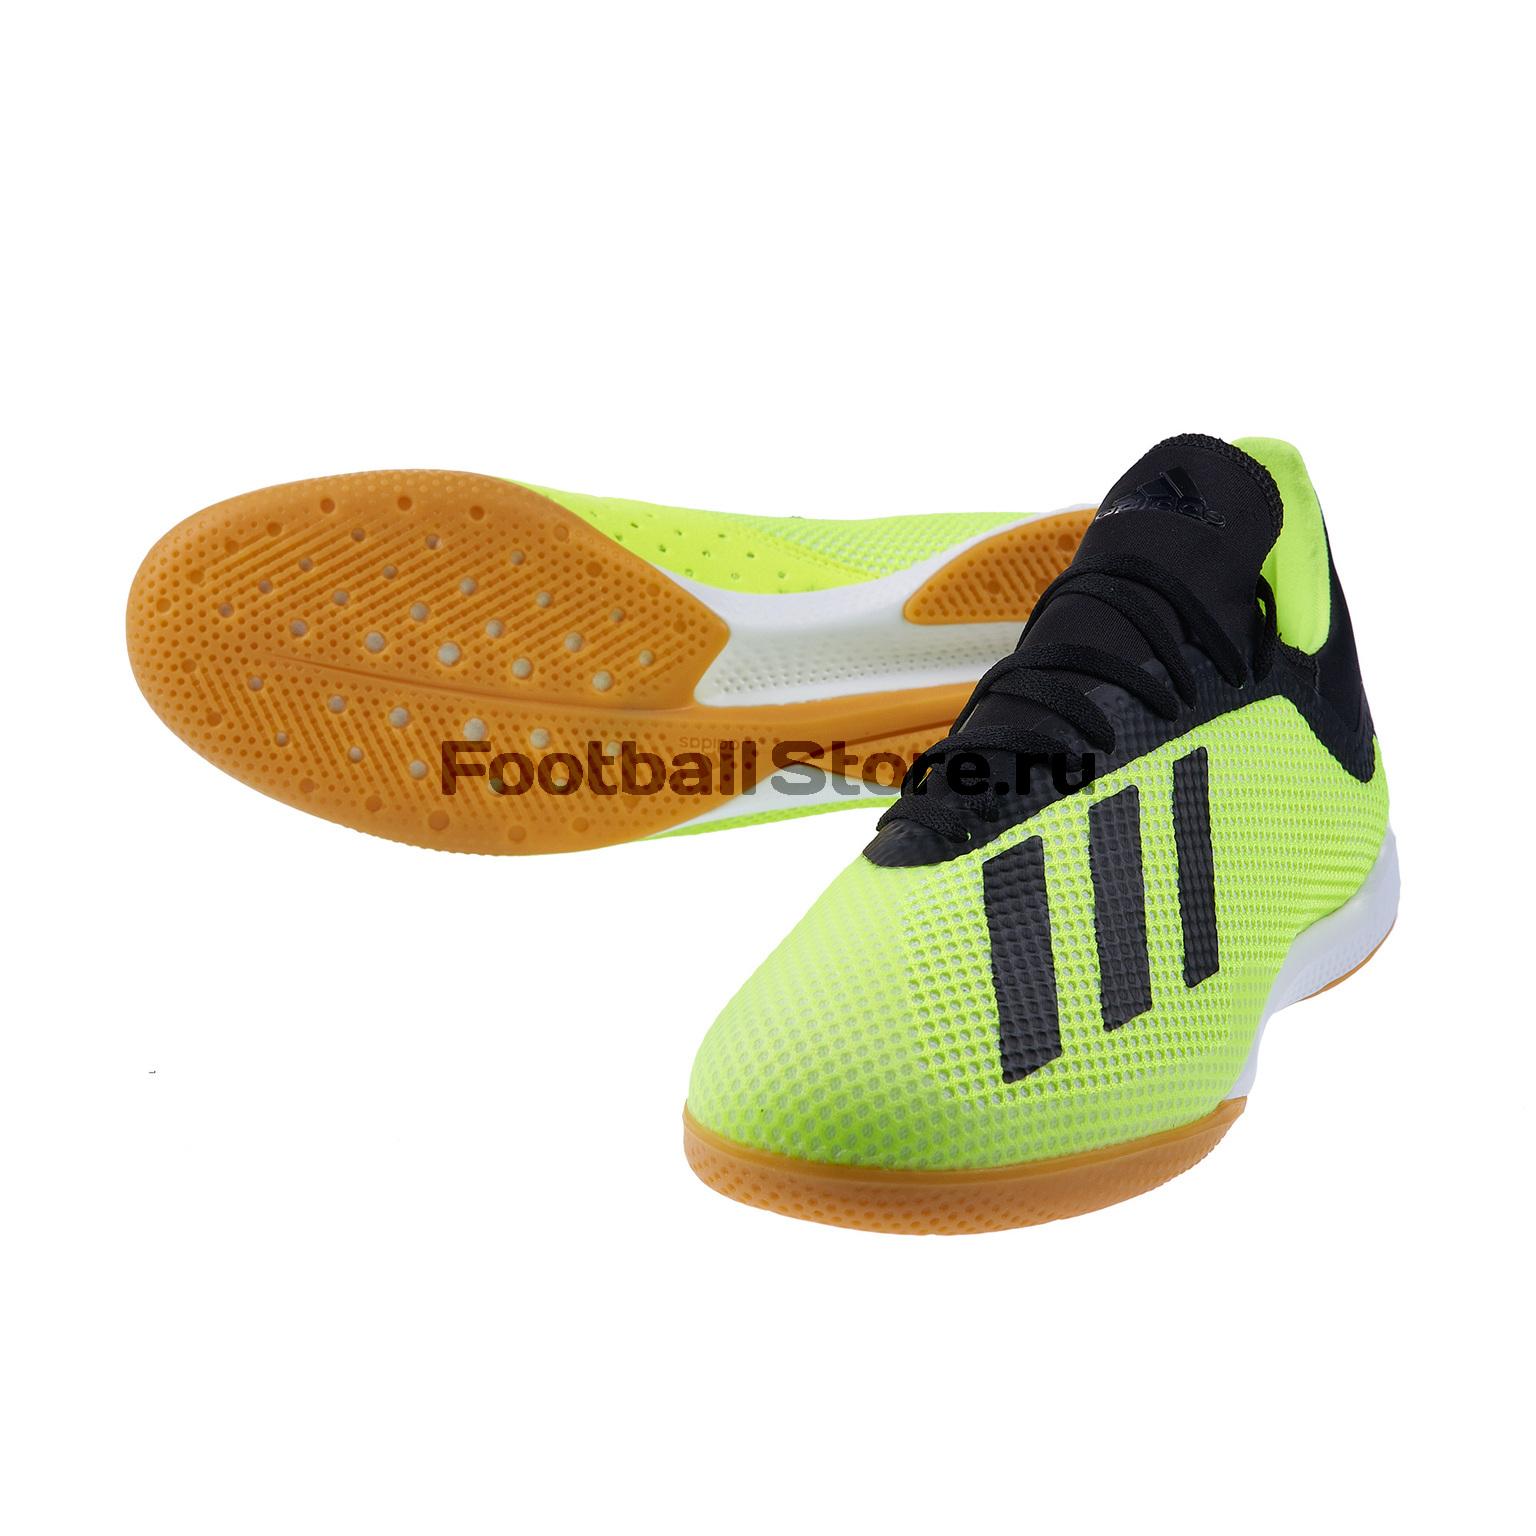 Обувь для зала Adidas X Tango 18.3 IN DB2441 обувь для зала adidas ace tango 18 3 in jr cp9075